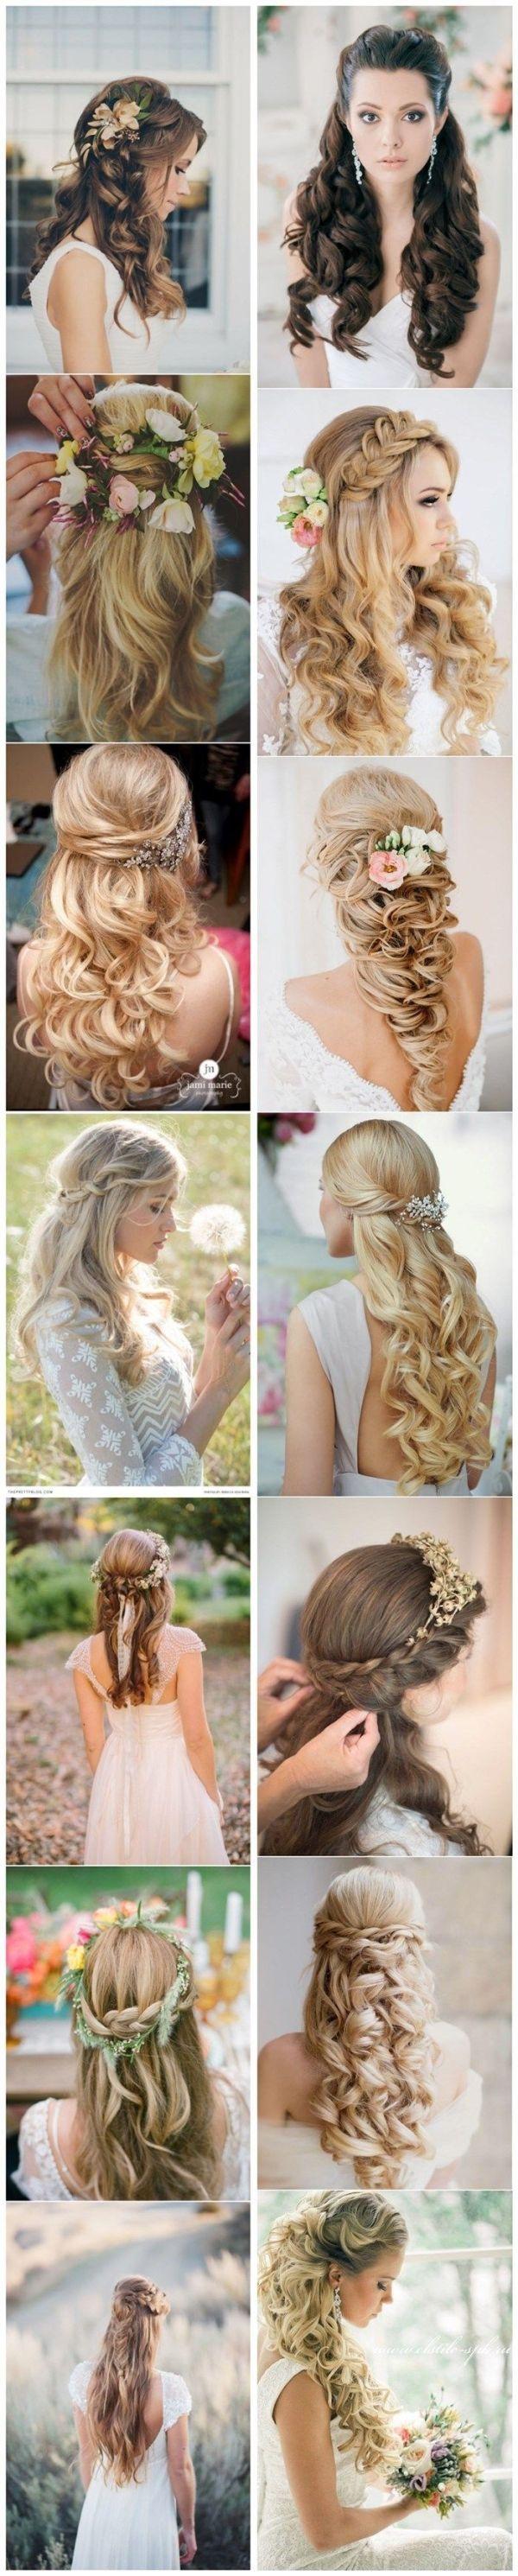 half up half down wedding hairstyles - wedding hair by Kelly Jelic